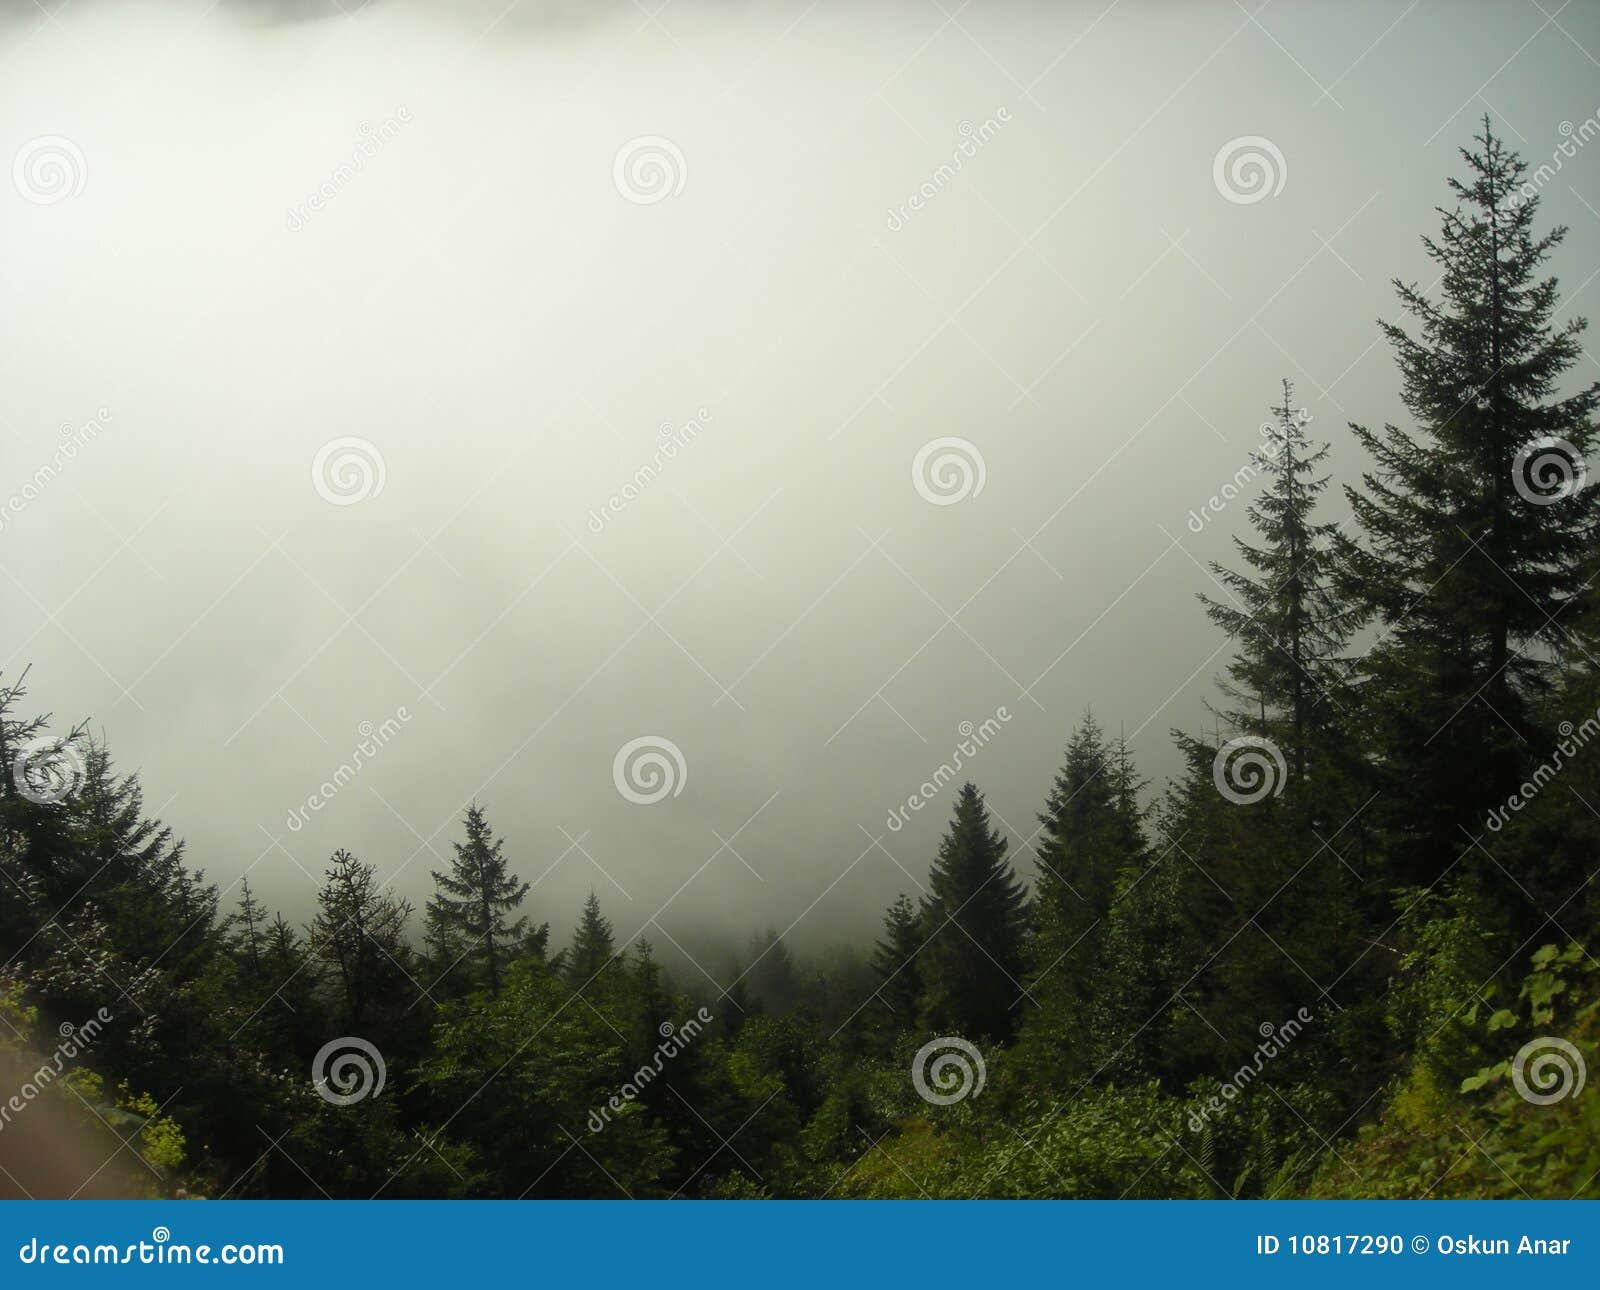 Kackar山